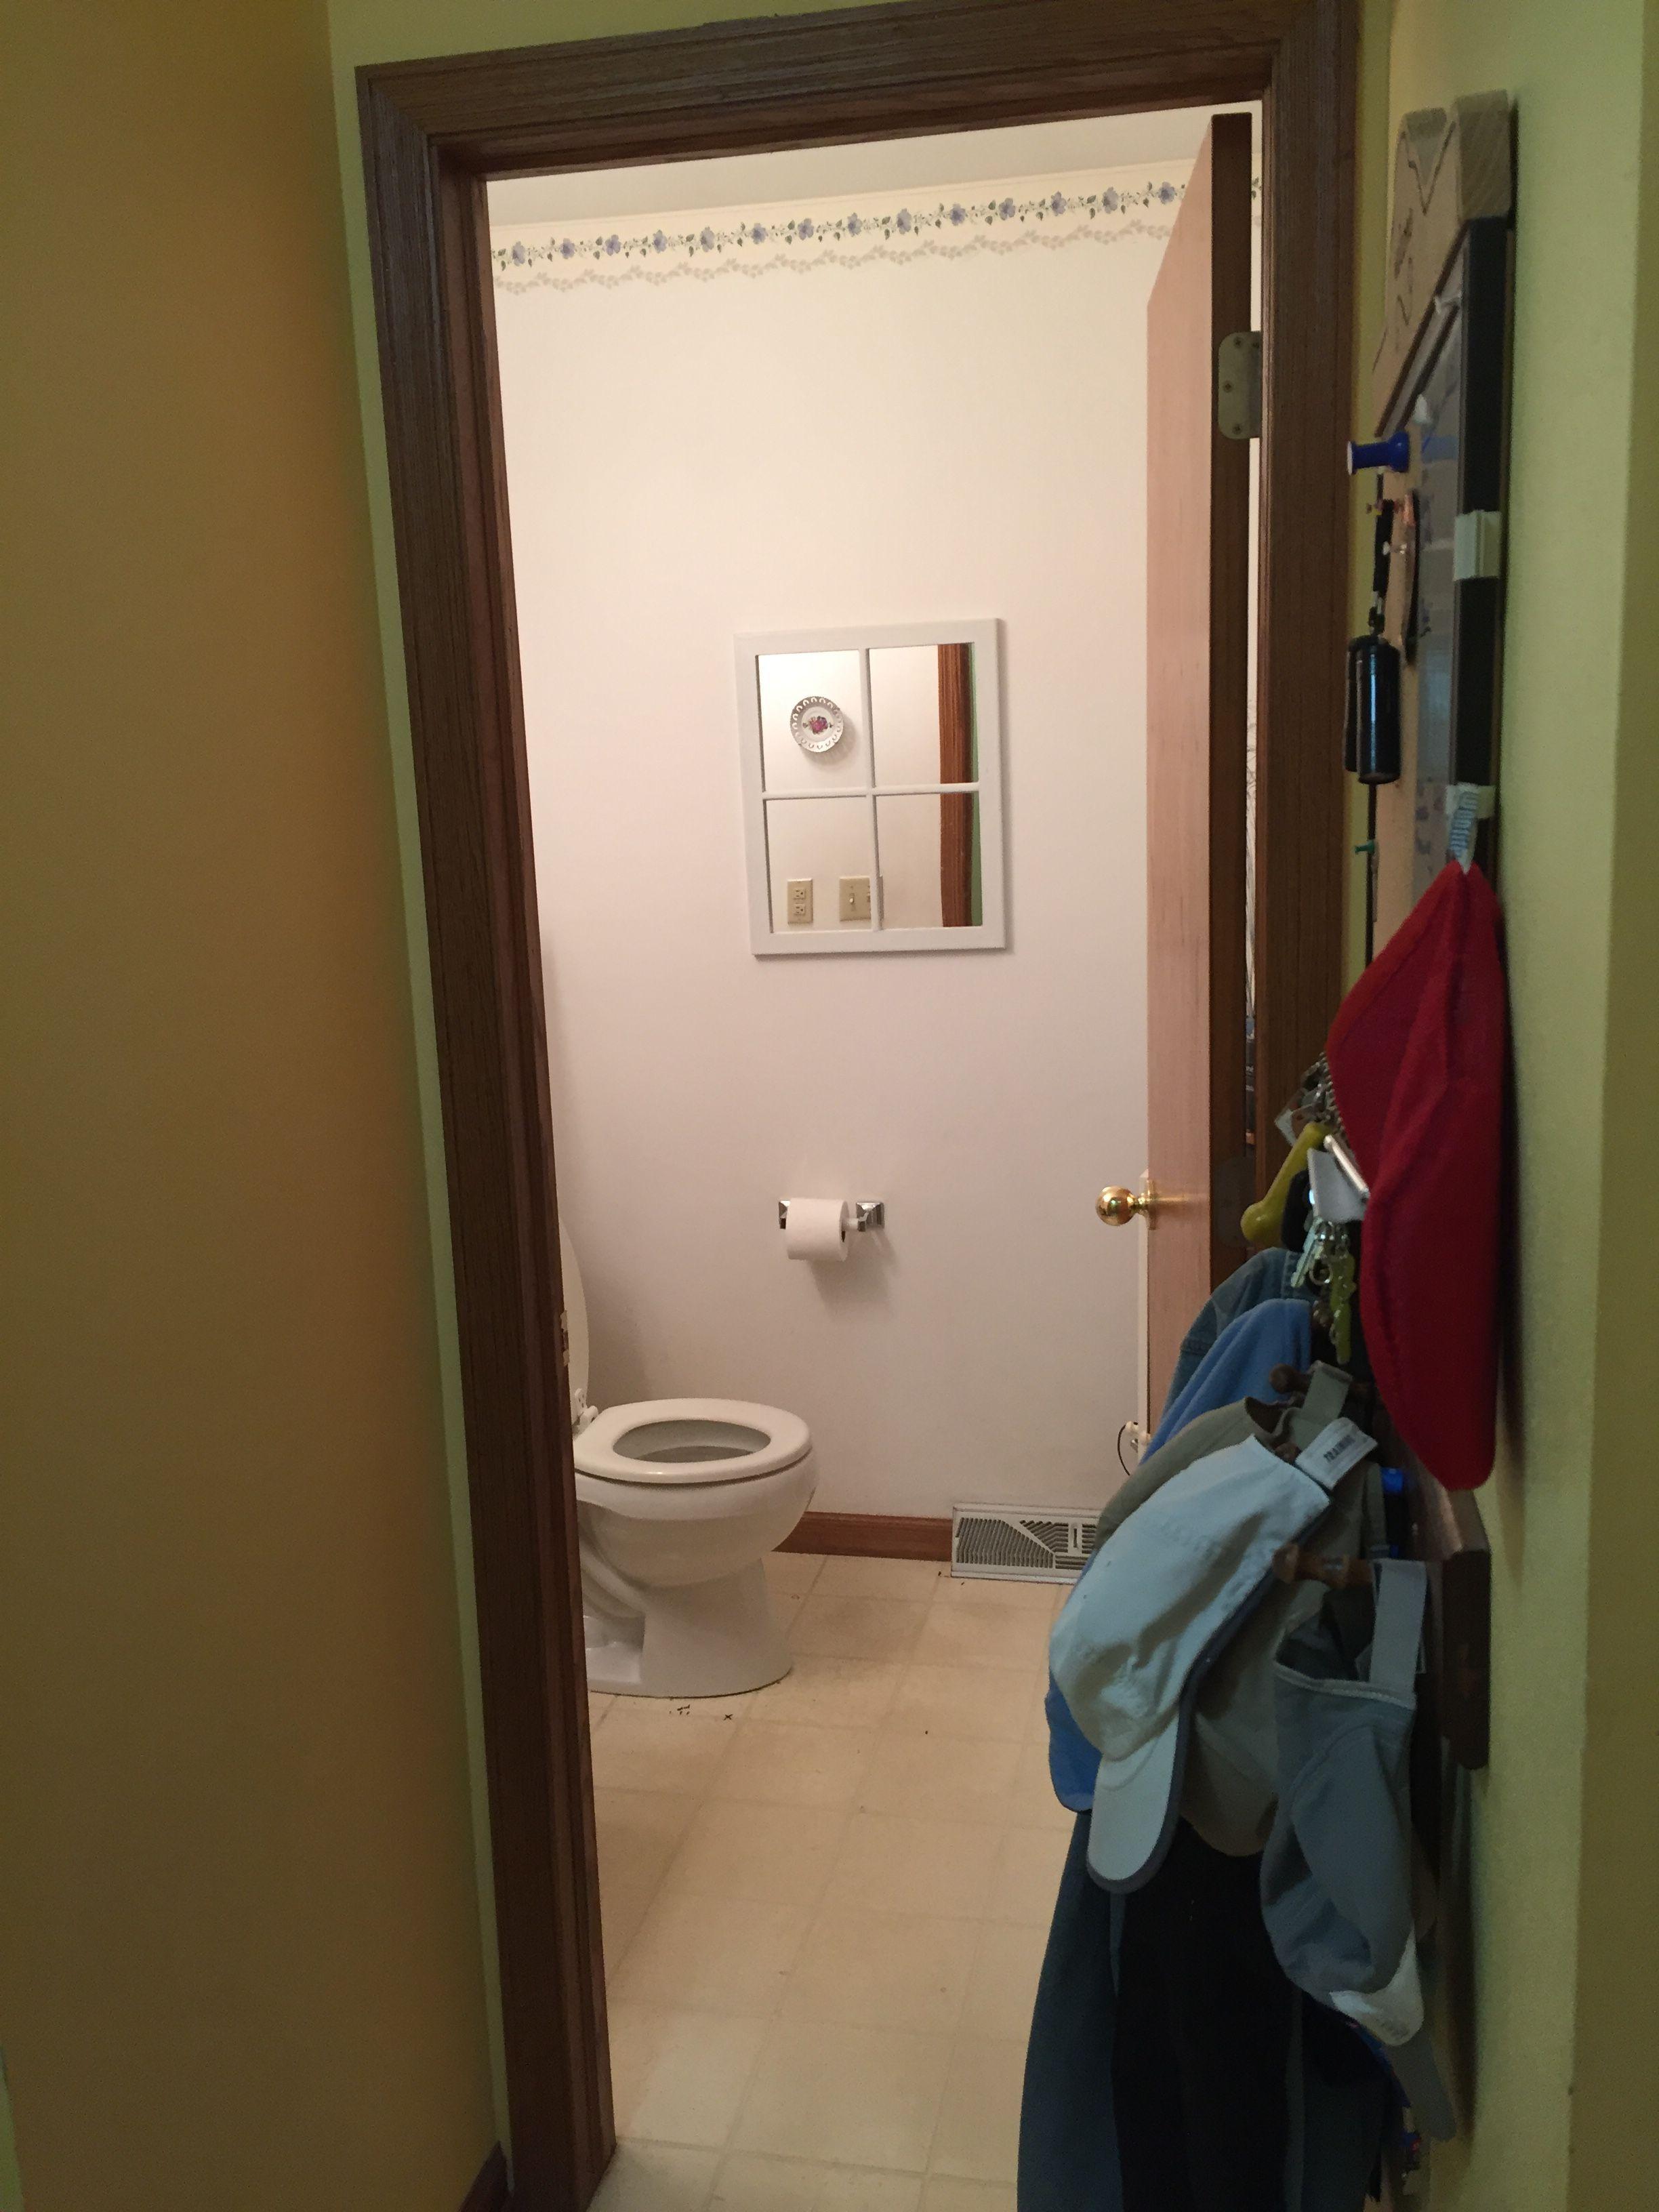 Pin By Doris Riener On Bath Update Toilet Bathroom Bath